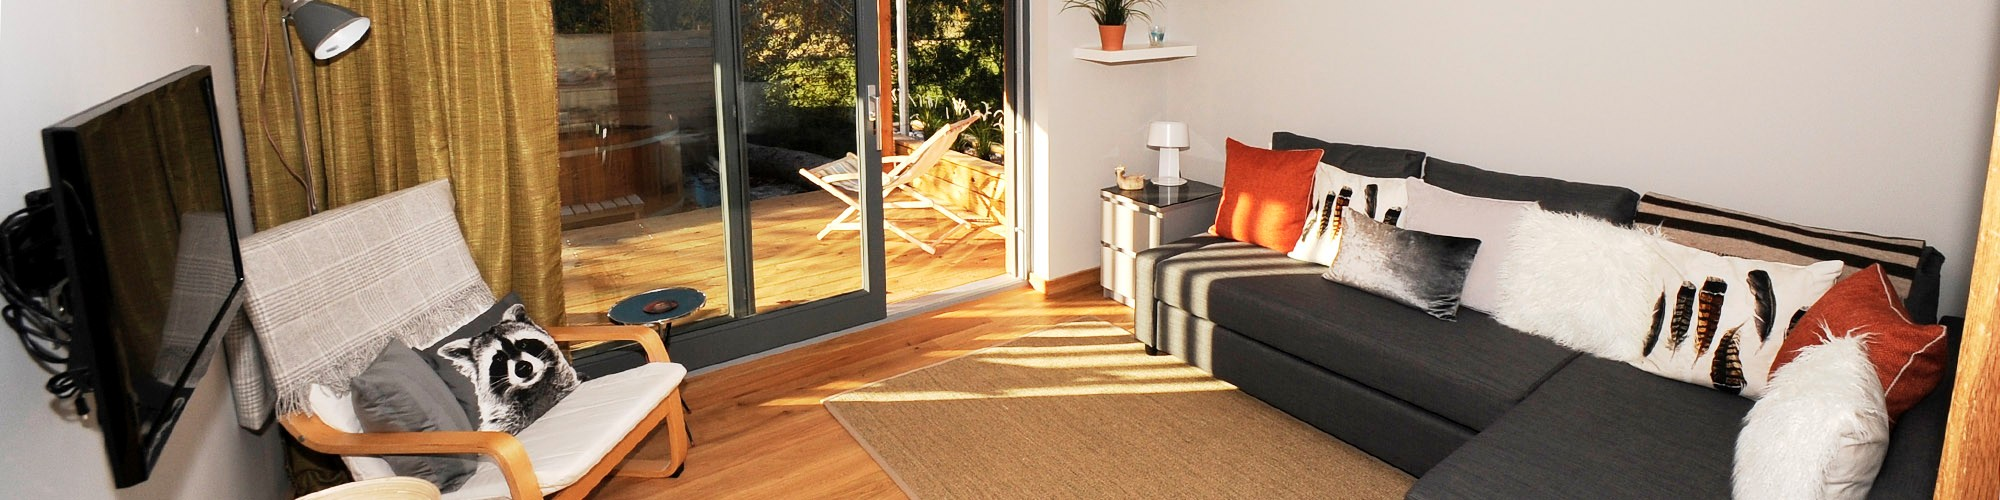 lounge-6775